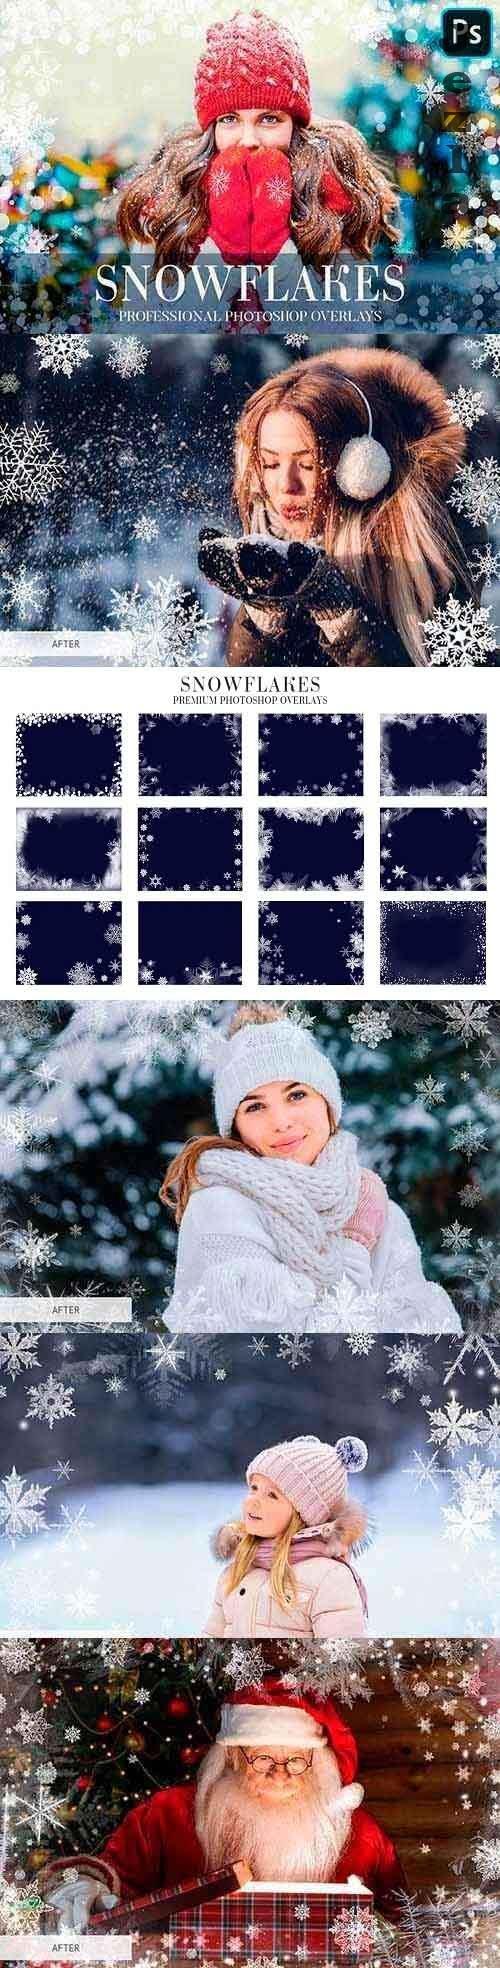 Winter Overlays Photoshop - 4949169